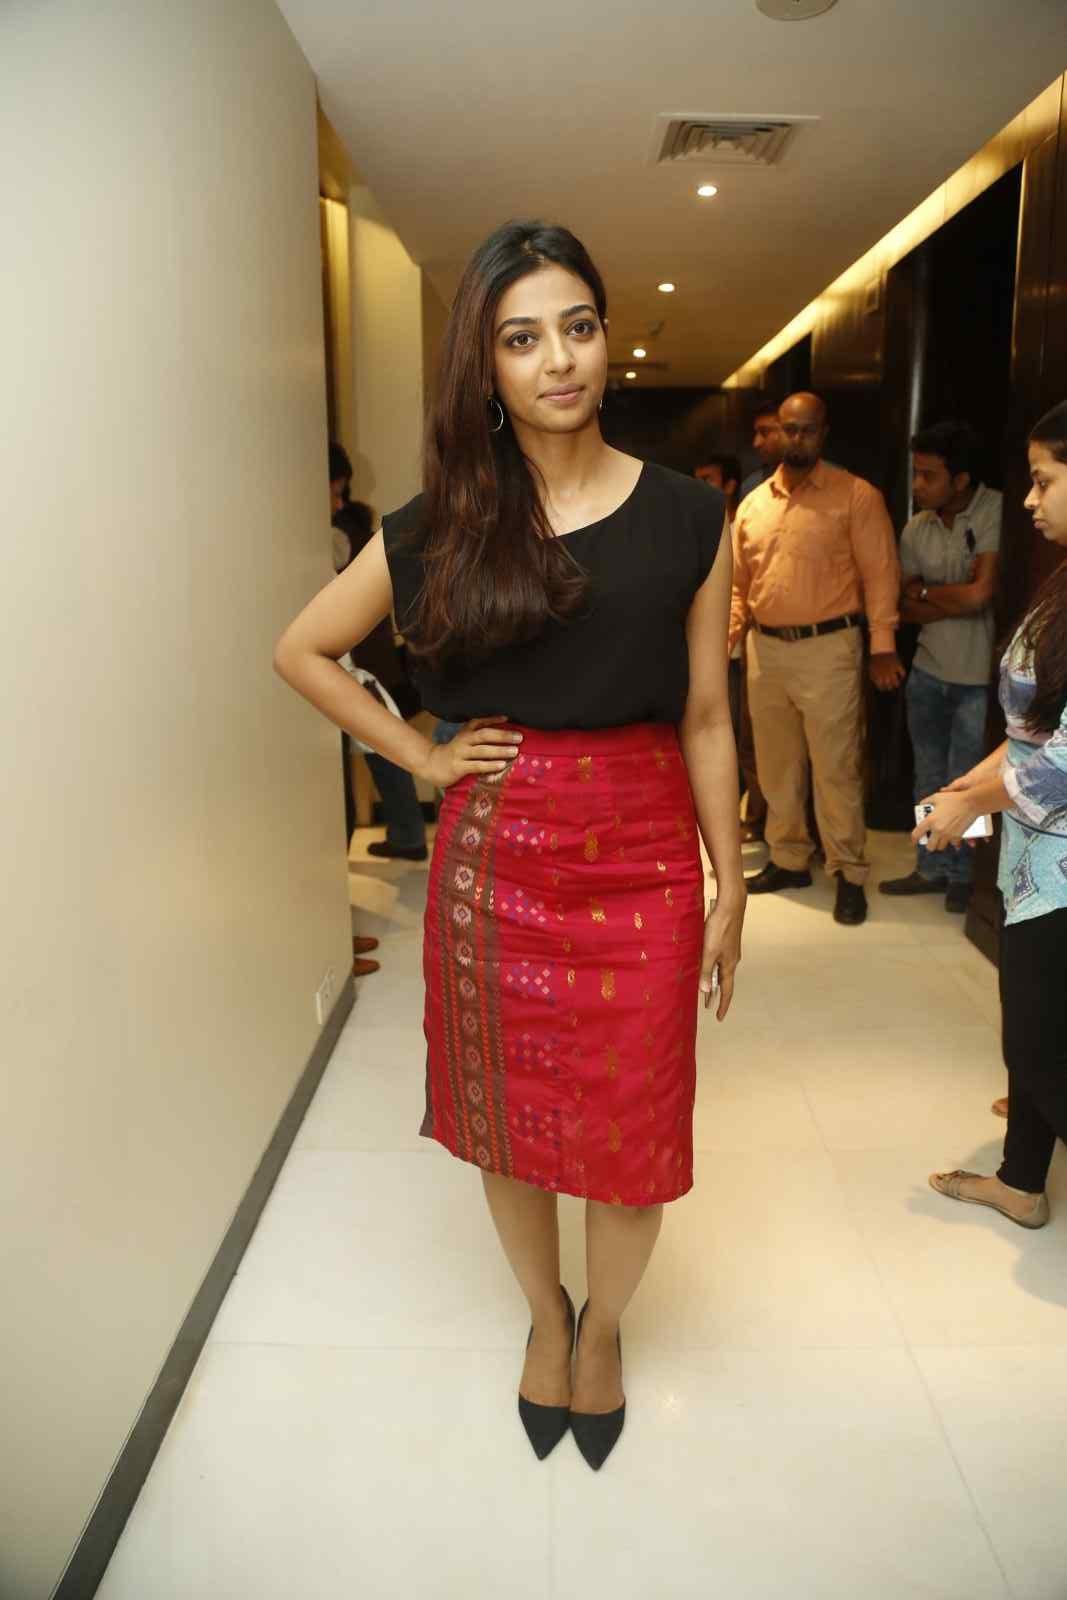 Radhika Apte Unseen So Hot Photos In Black Dress